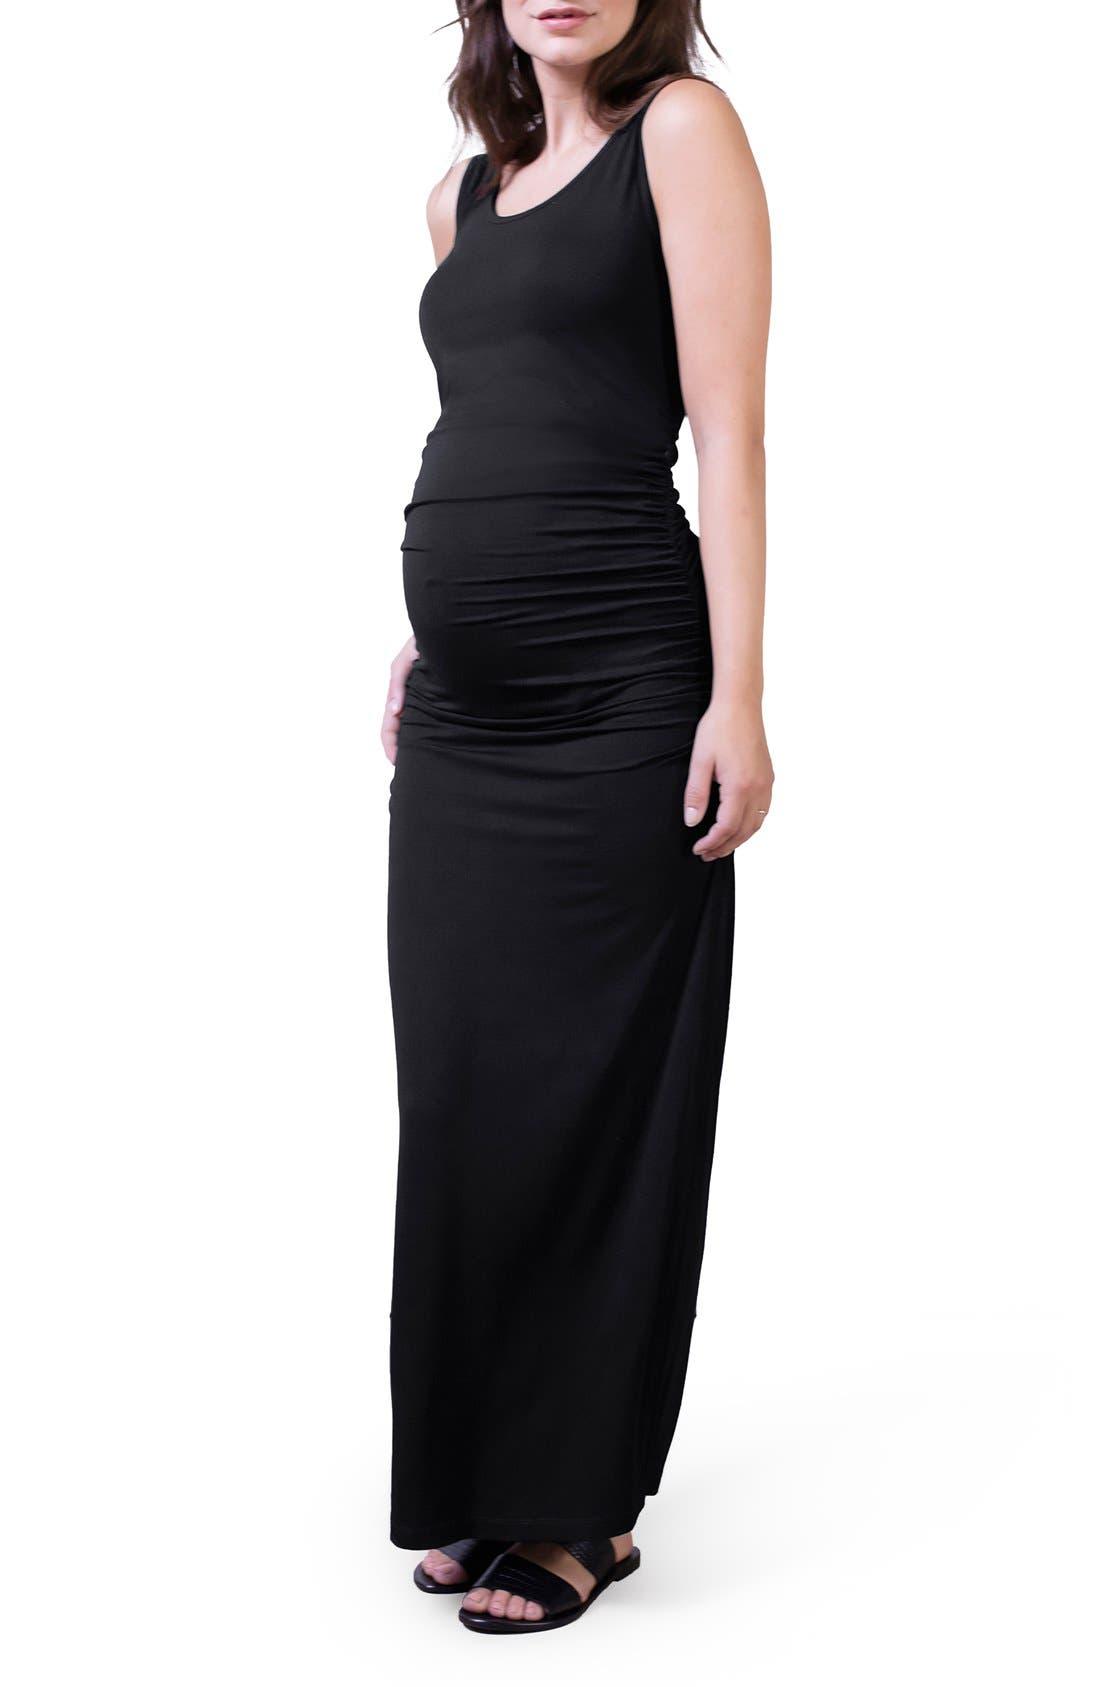 Alternate Image 1 Selected - Isabella Oliver 'Lisle' Maternity Maxi Tank Dress